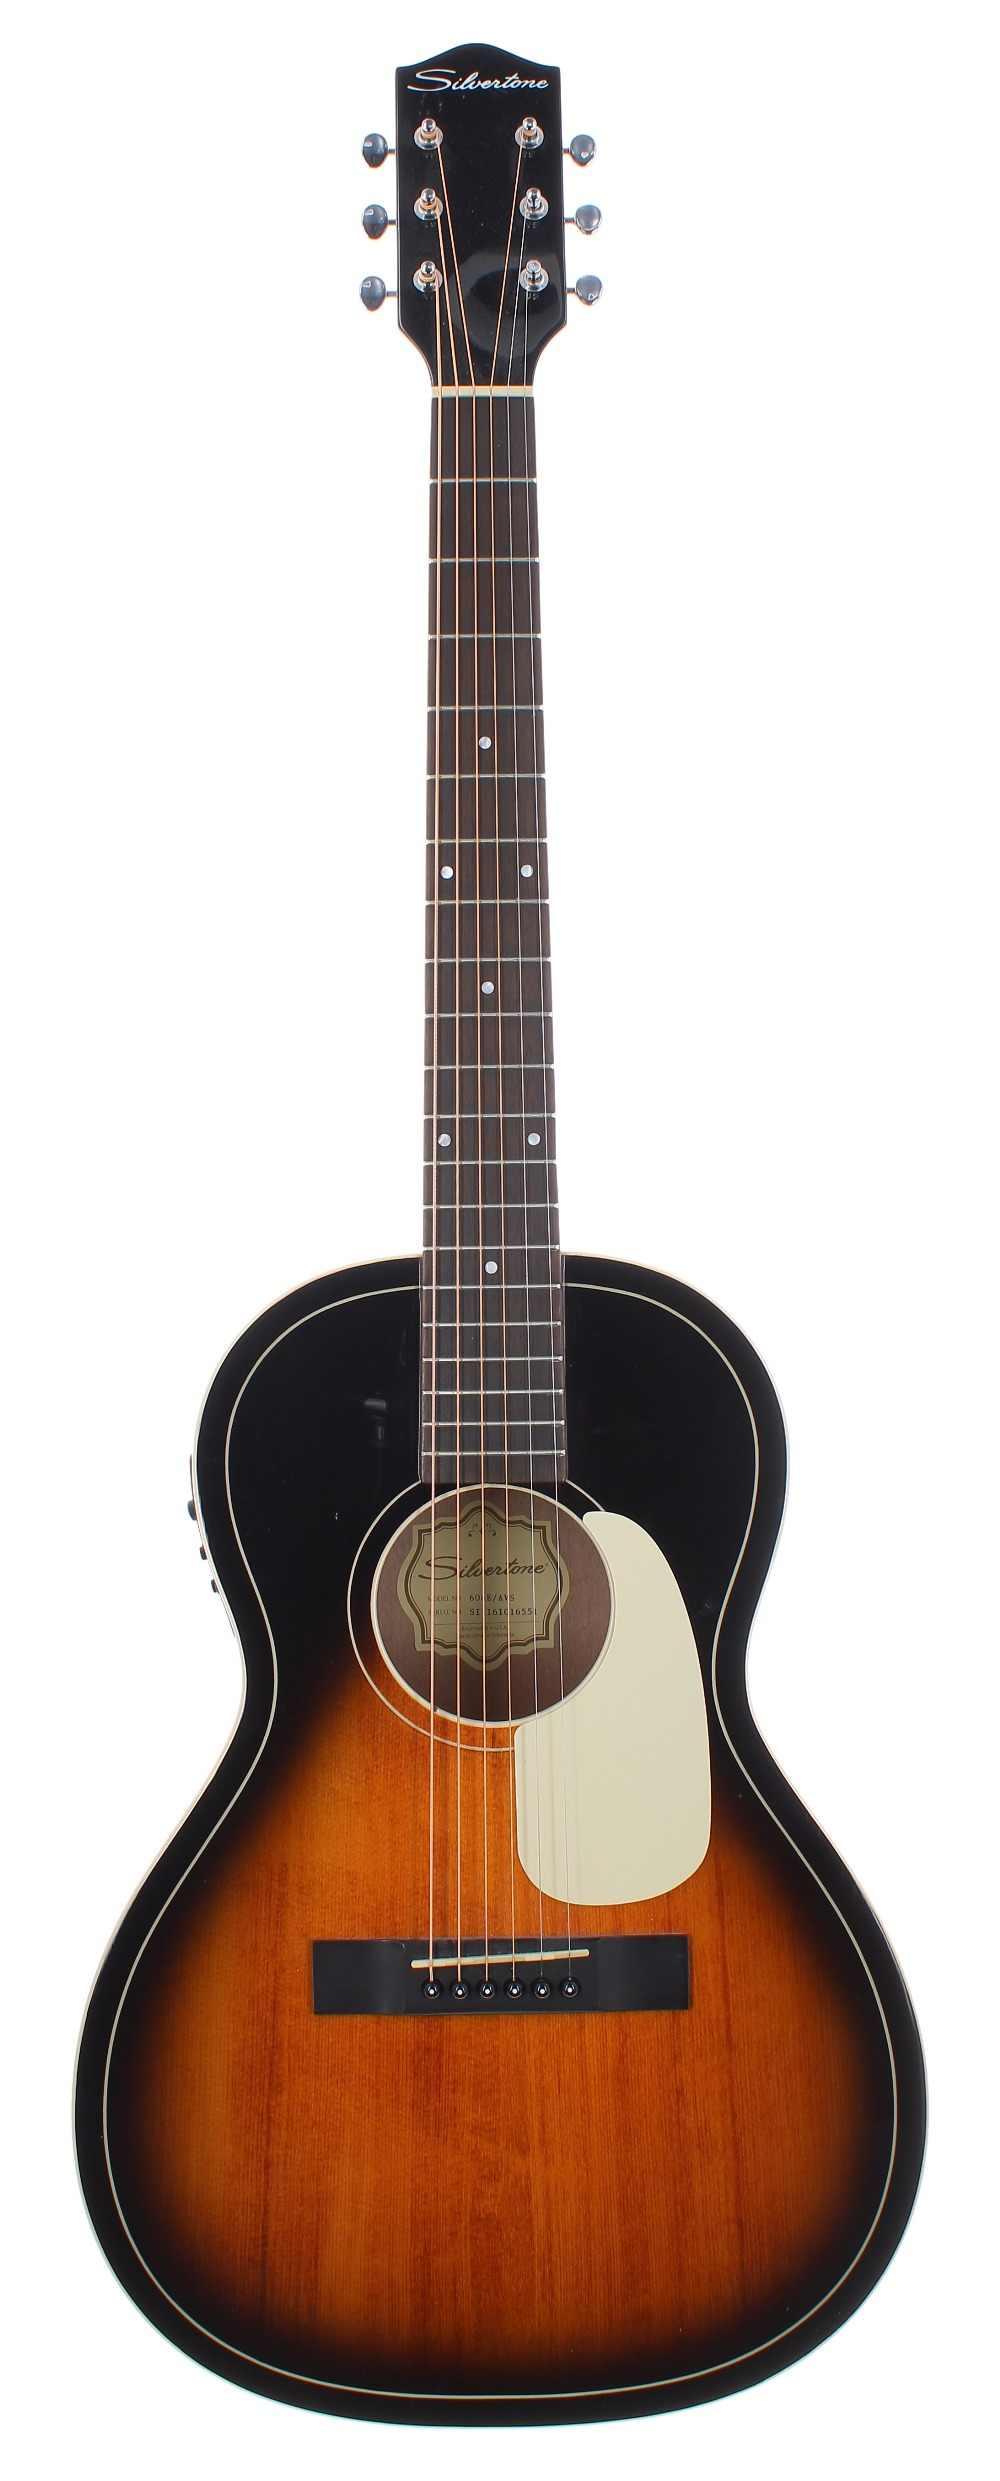 2016 Silvertone 604E/AVS electro-acoustic guitar, made in Indonesia, ser. no. SI16xxxxxx1; Finish: